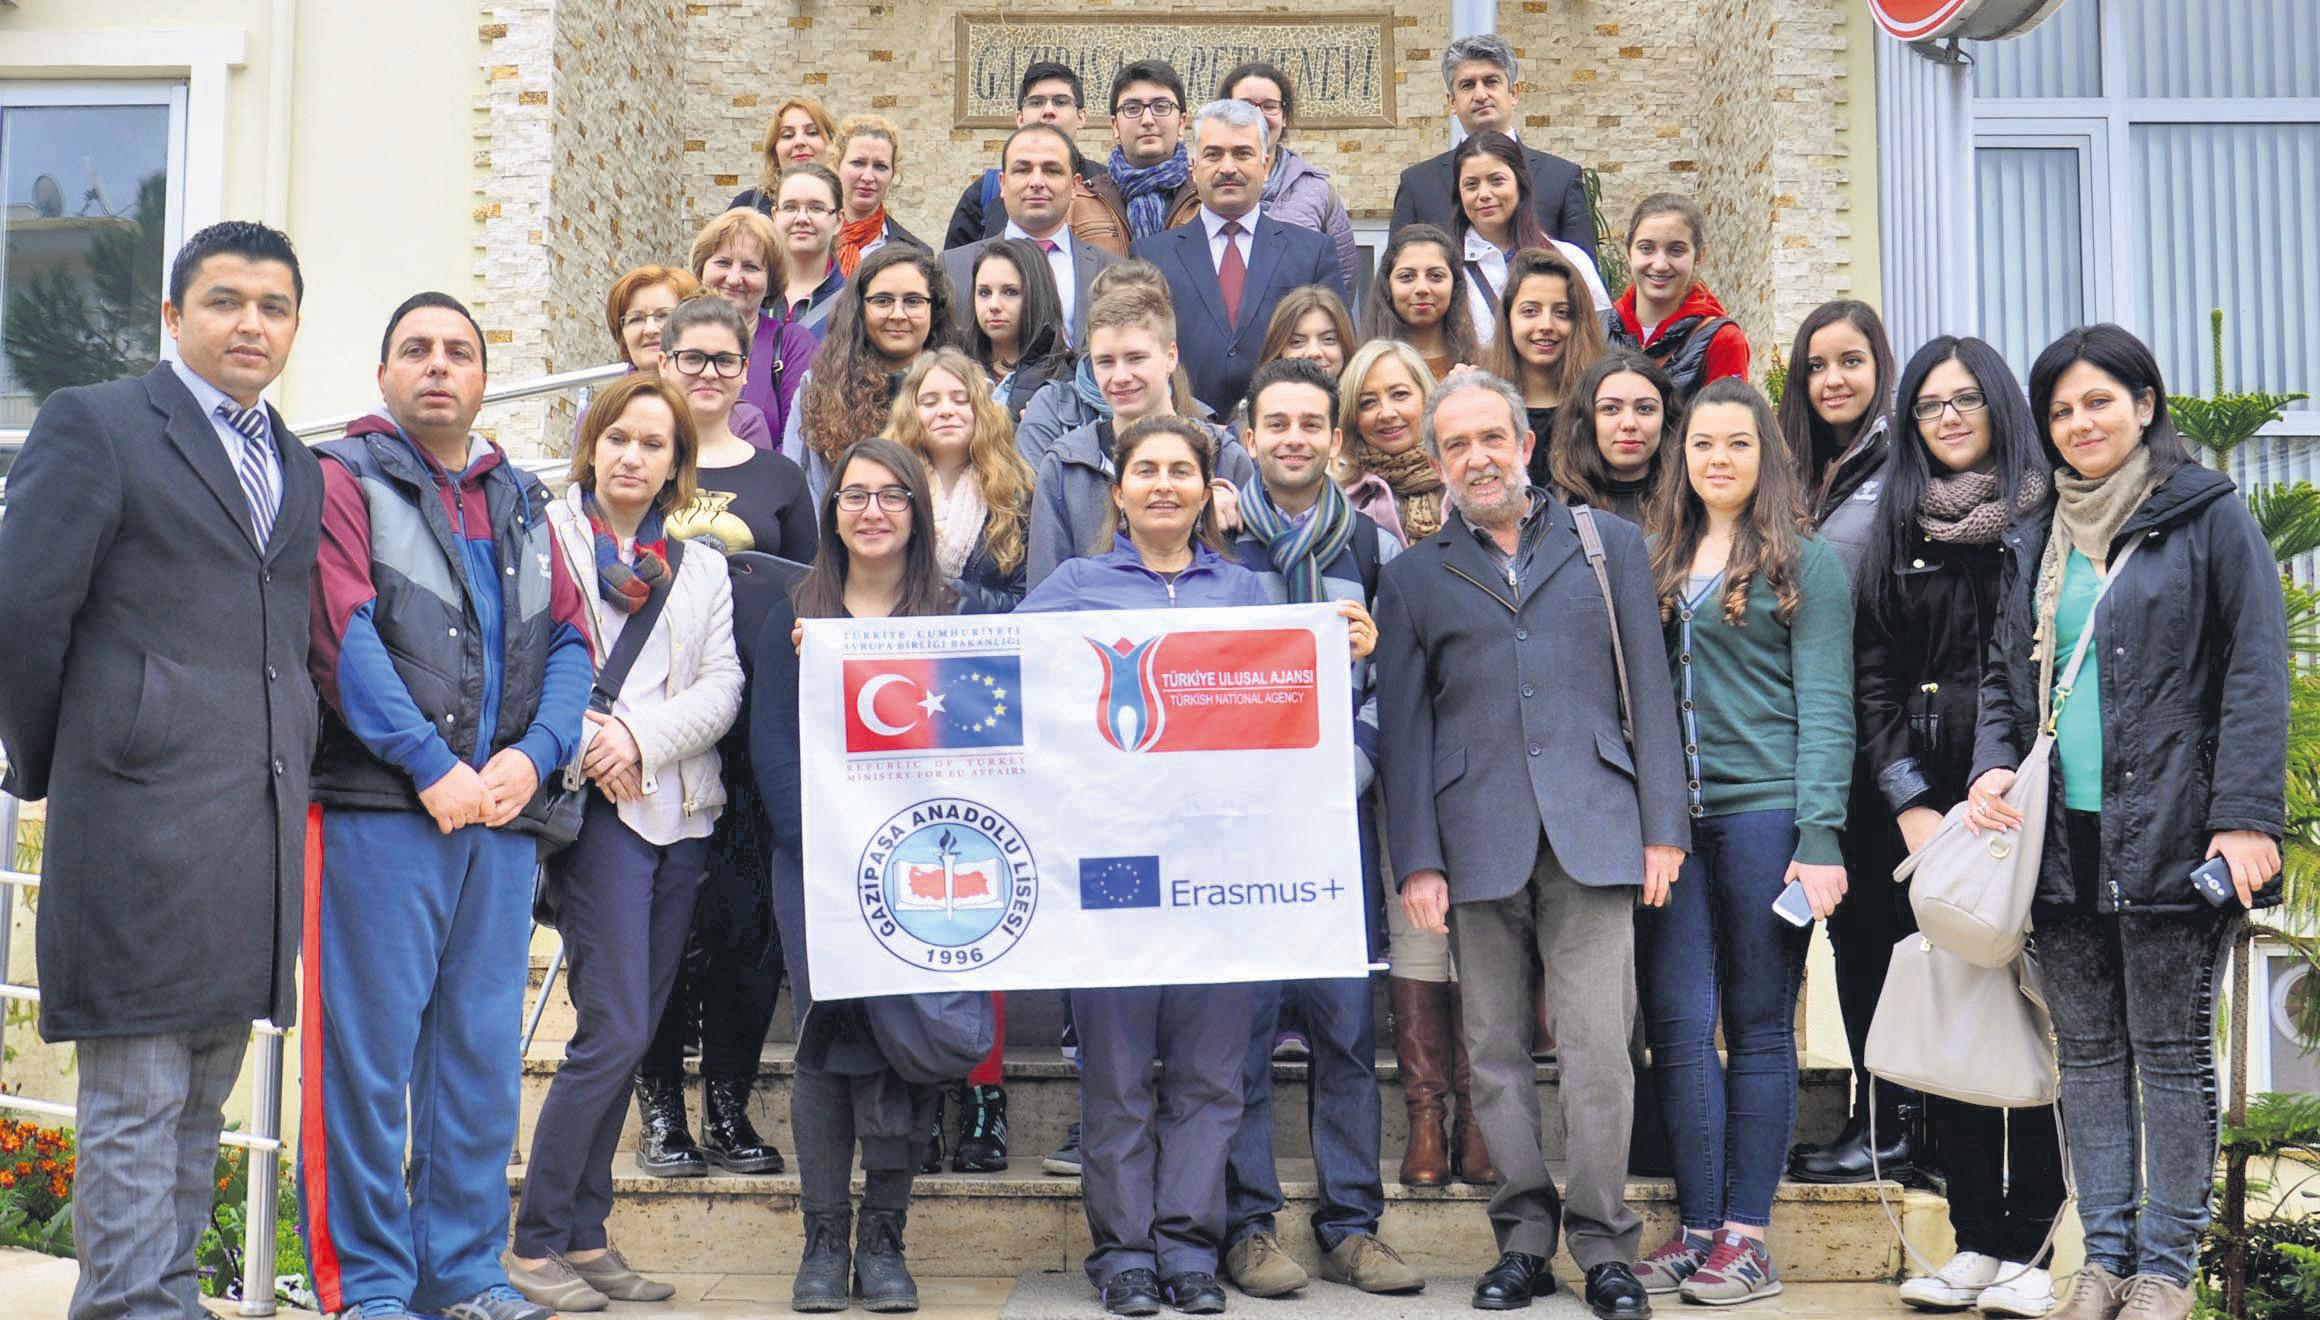 Half a million students to go to Europe on Erasmus